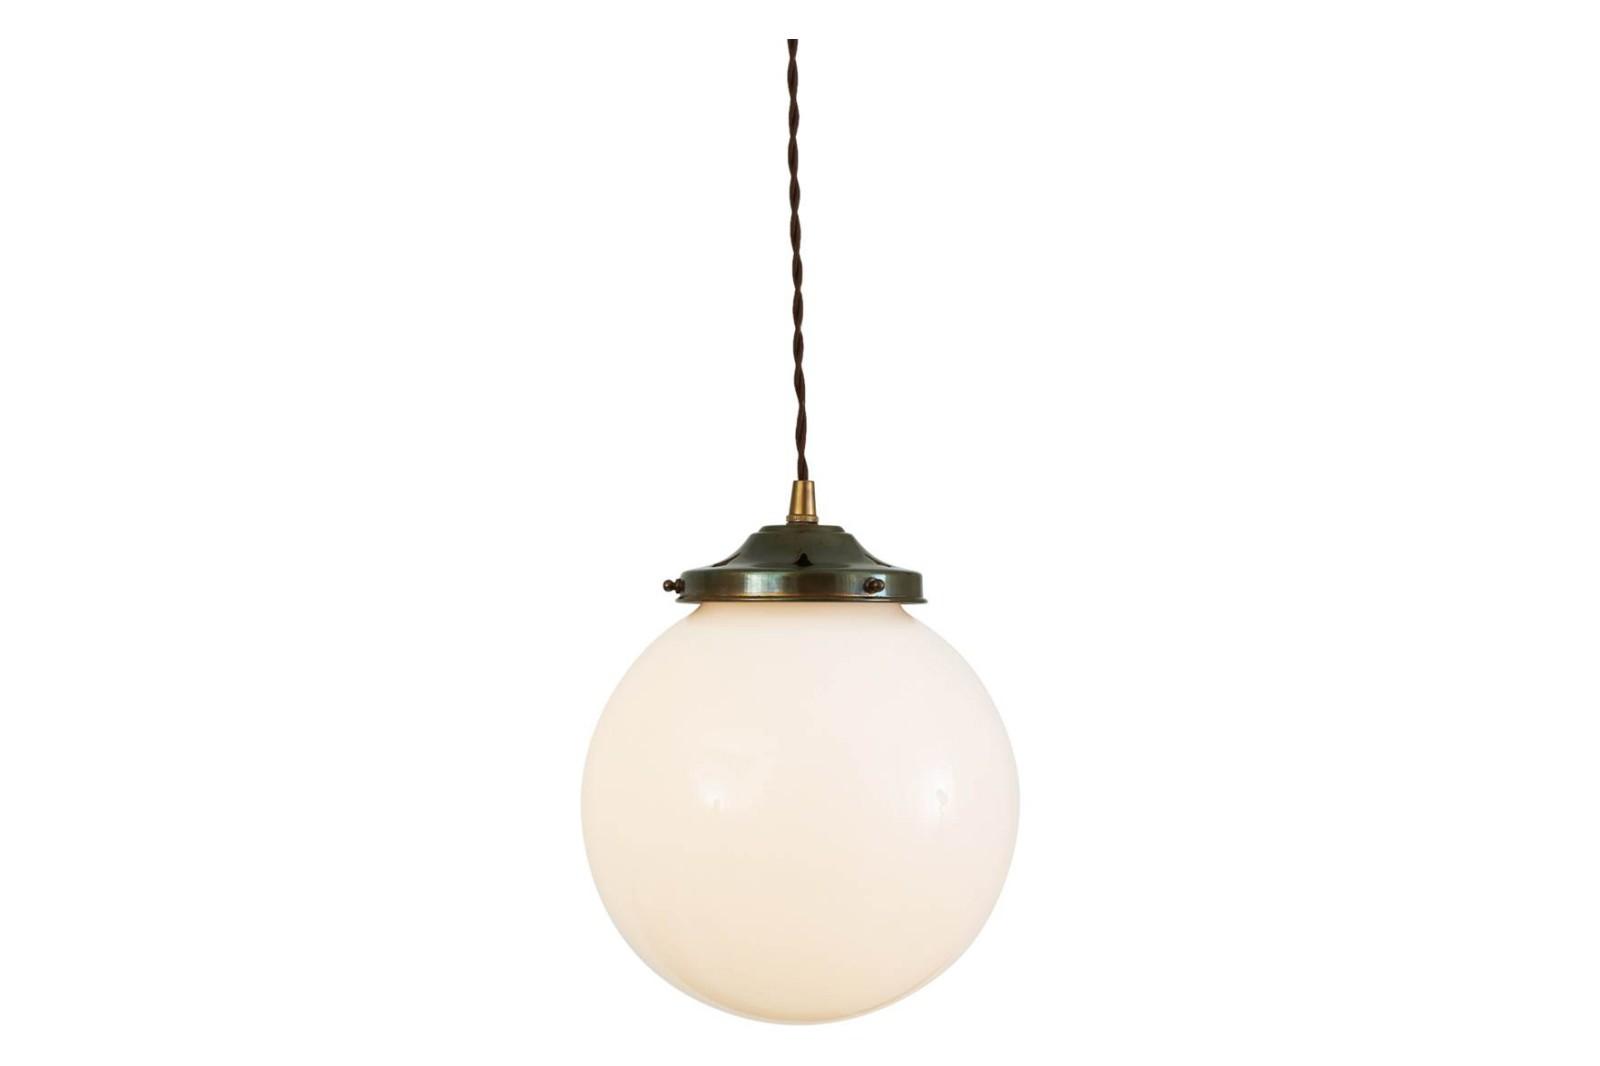 Gentry Opal Globe Pendant Light, 20cm Antique Brass